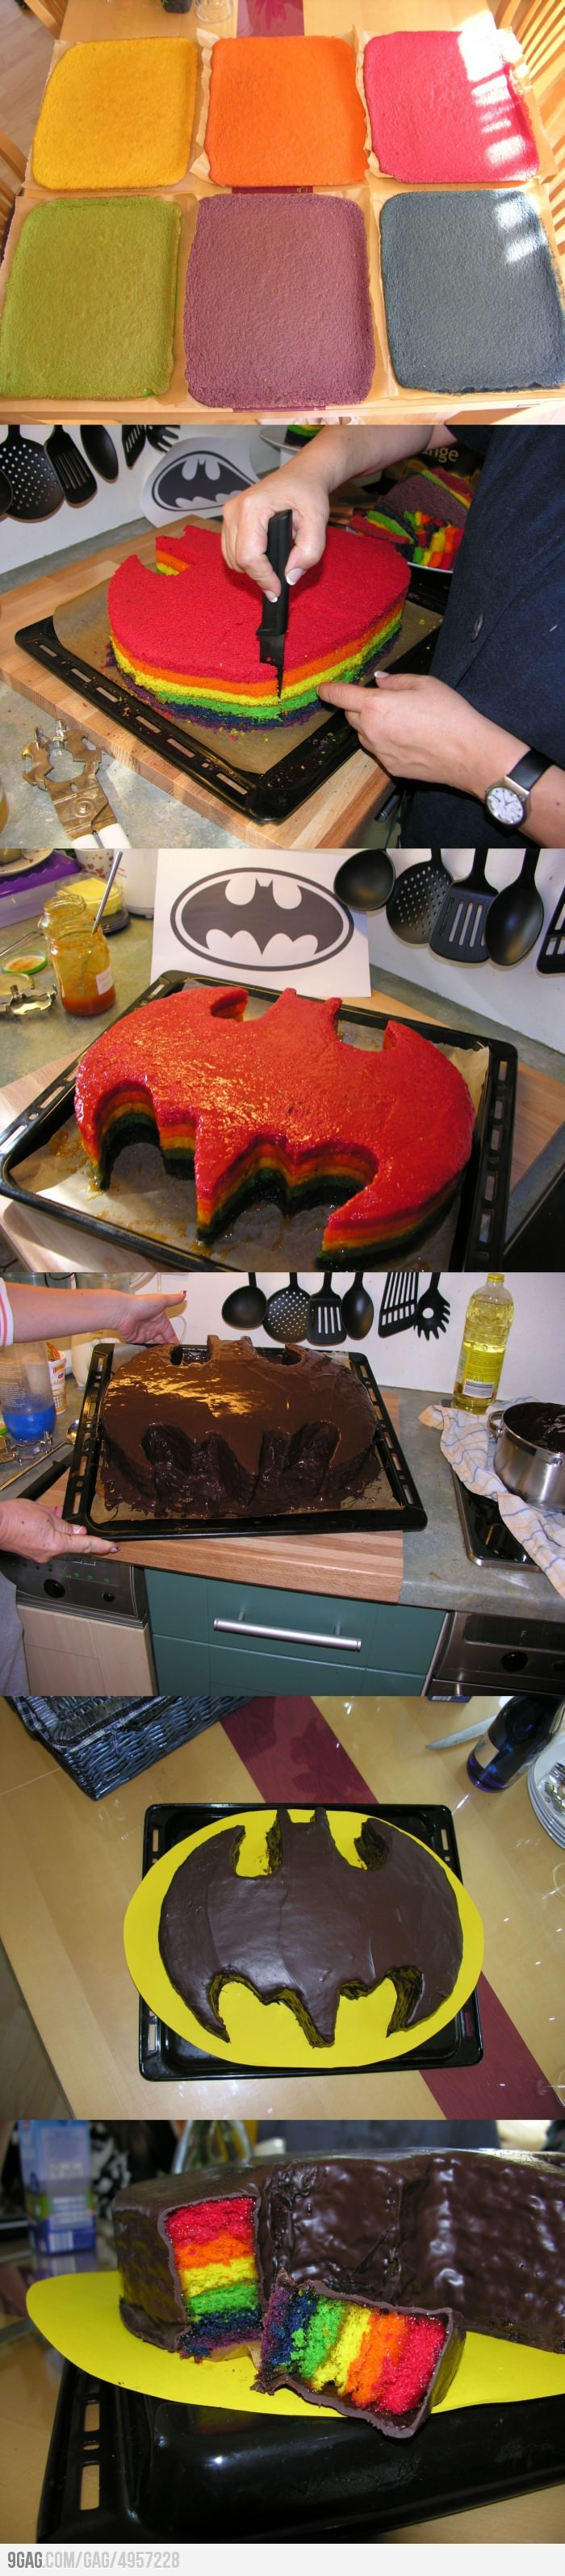 Batman Cake - Kids Party Crafts